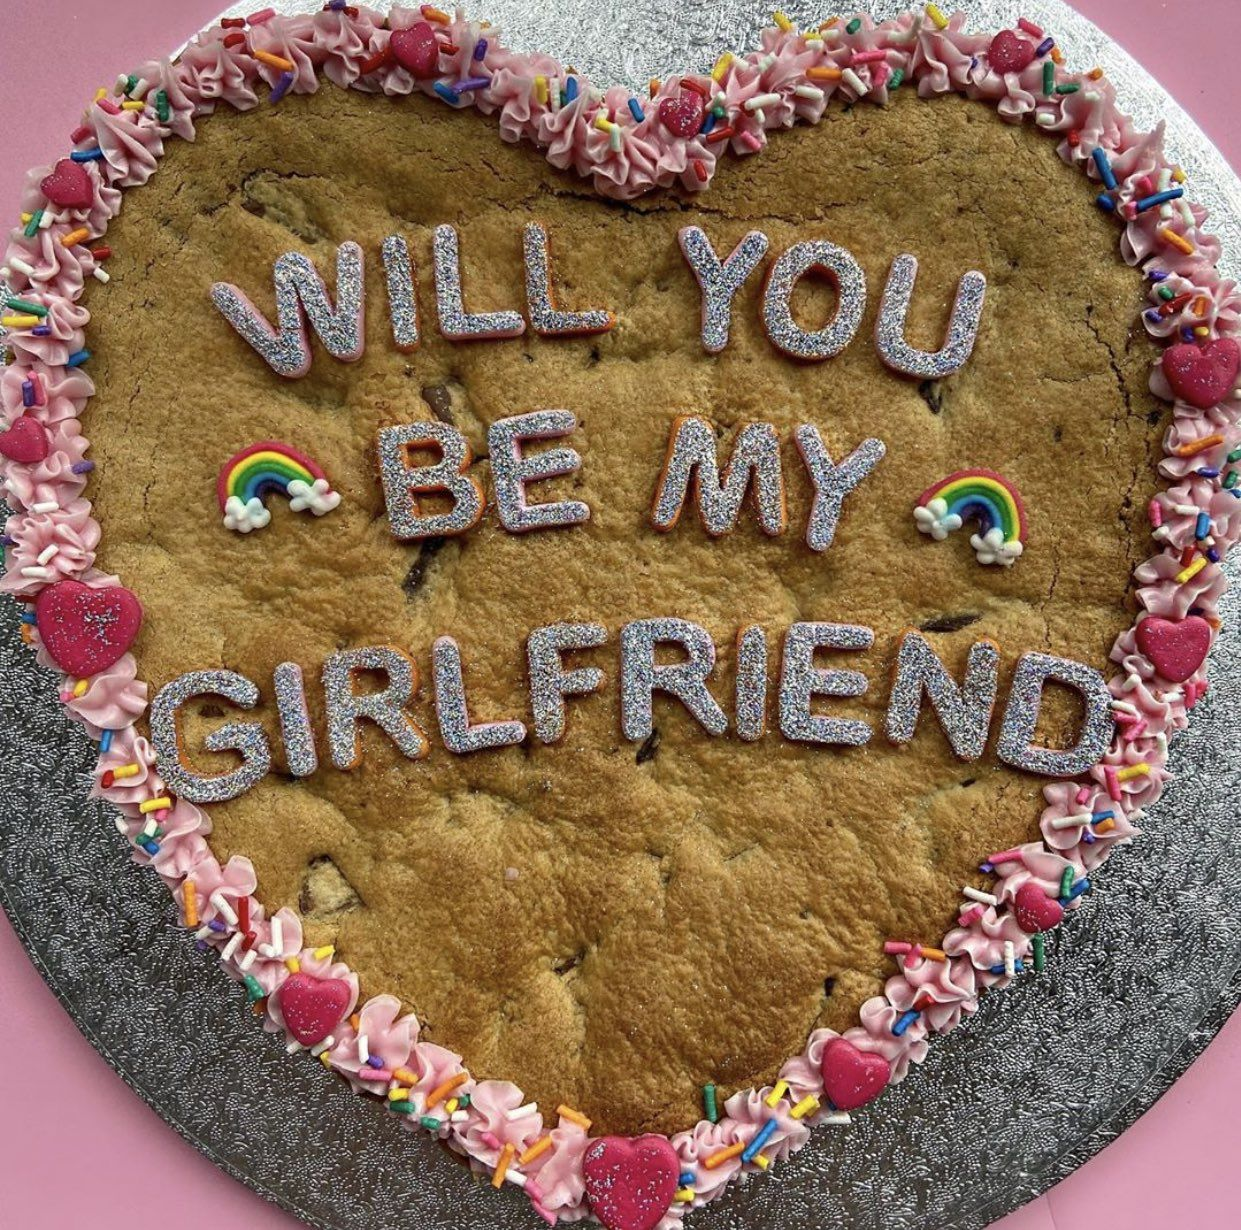 ʚ♡⃛ɞ on Twitter in 2021   Will you be my girlfriend